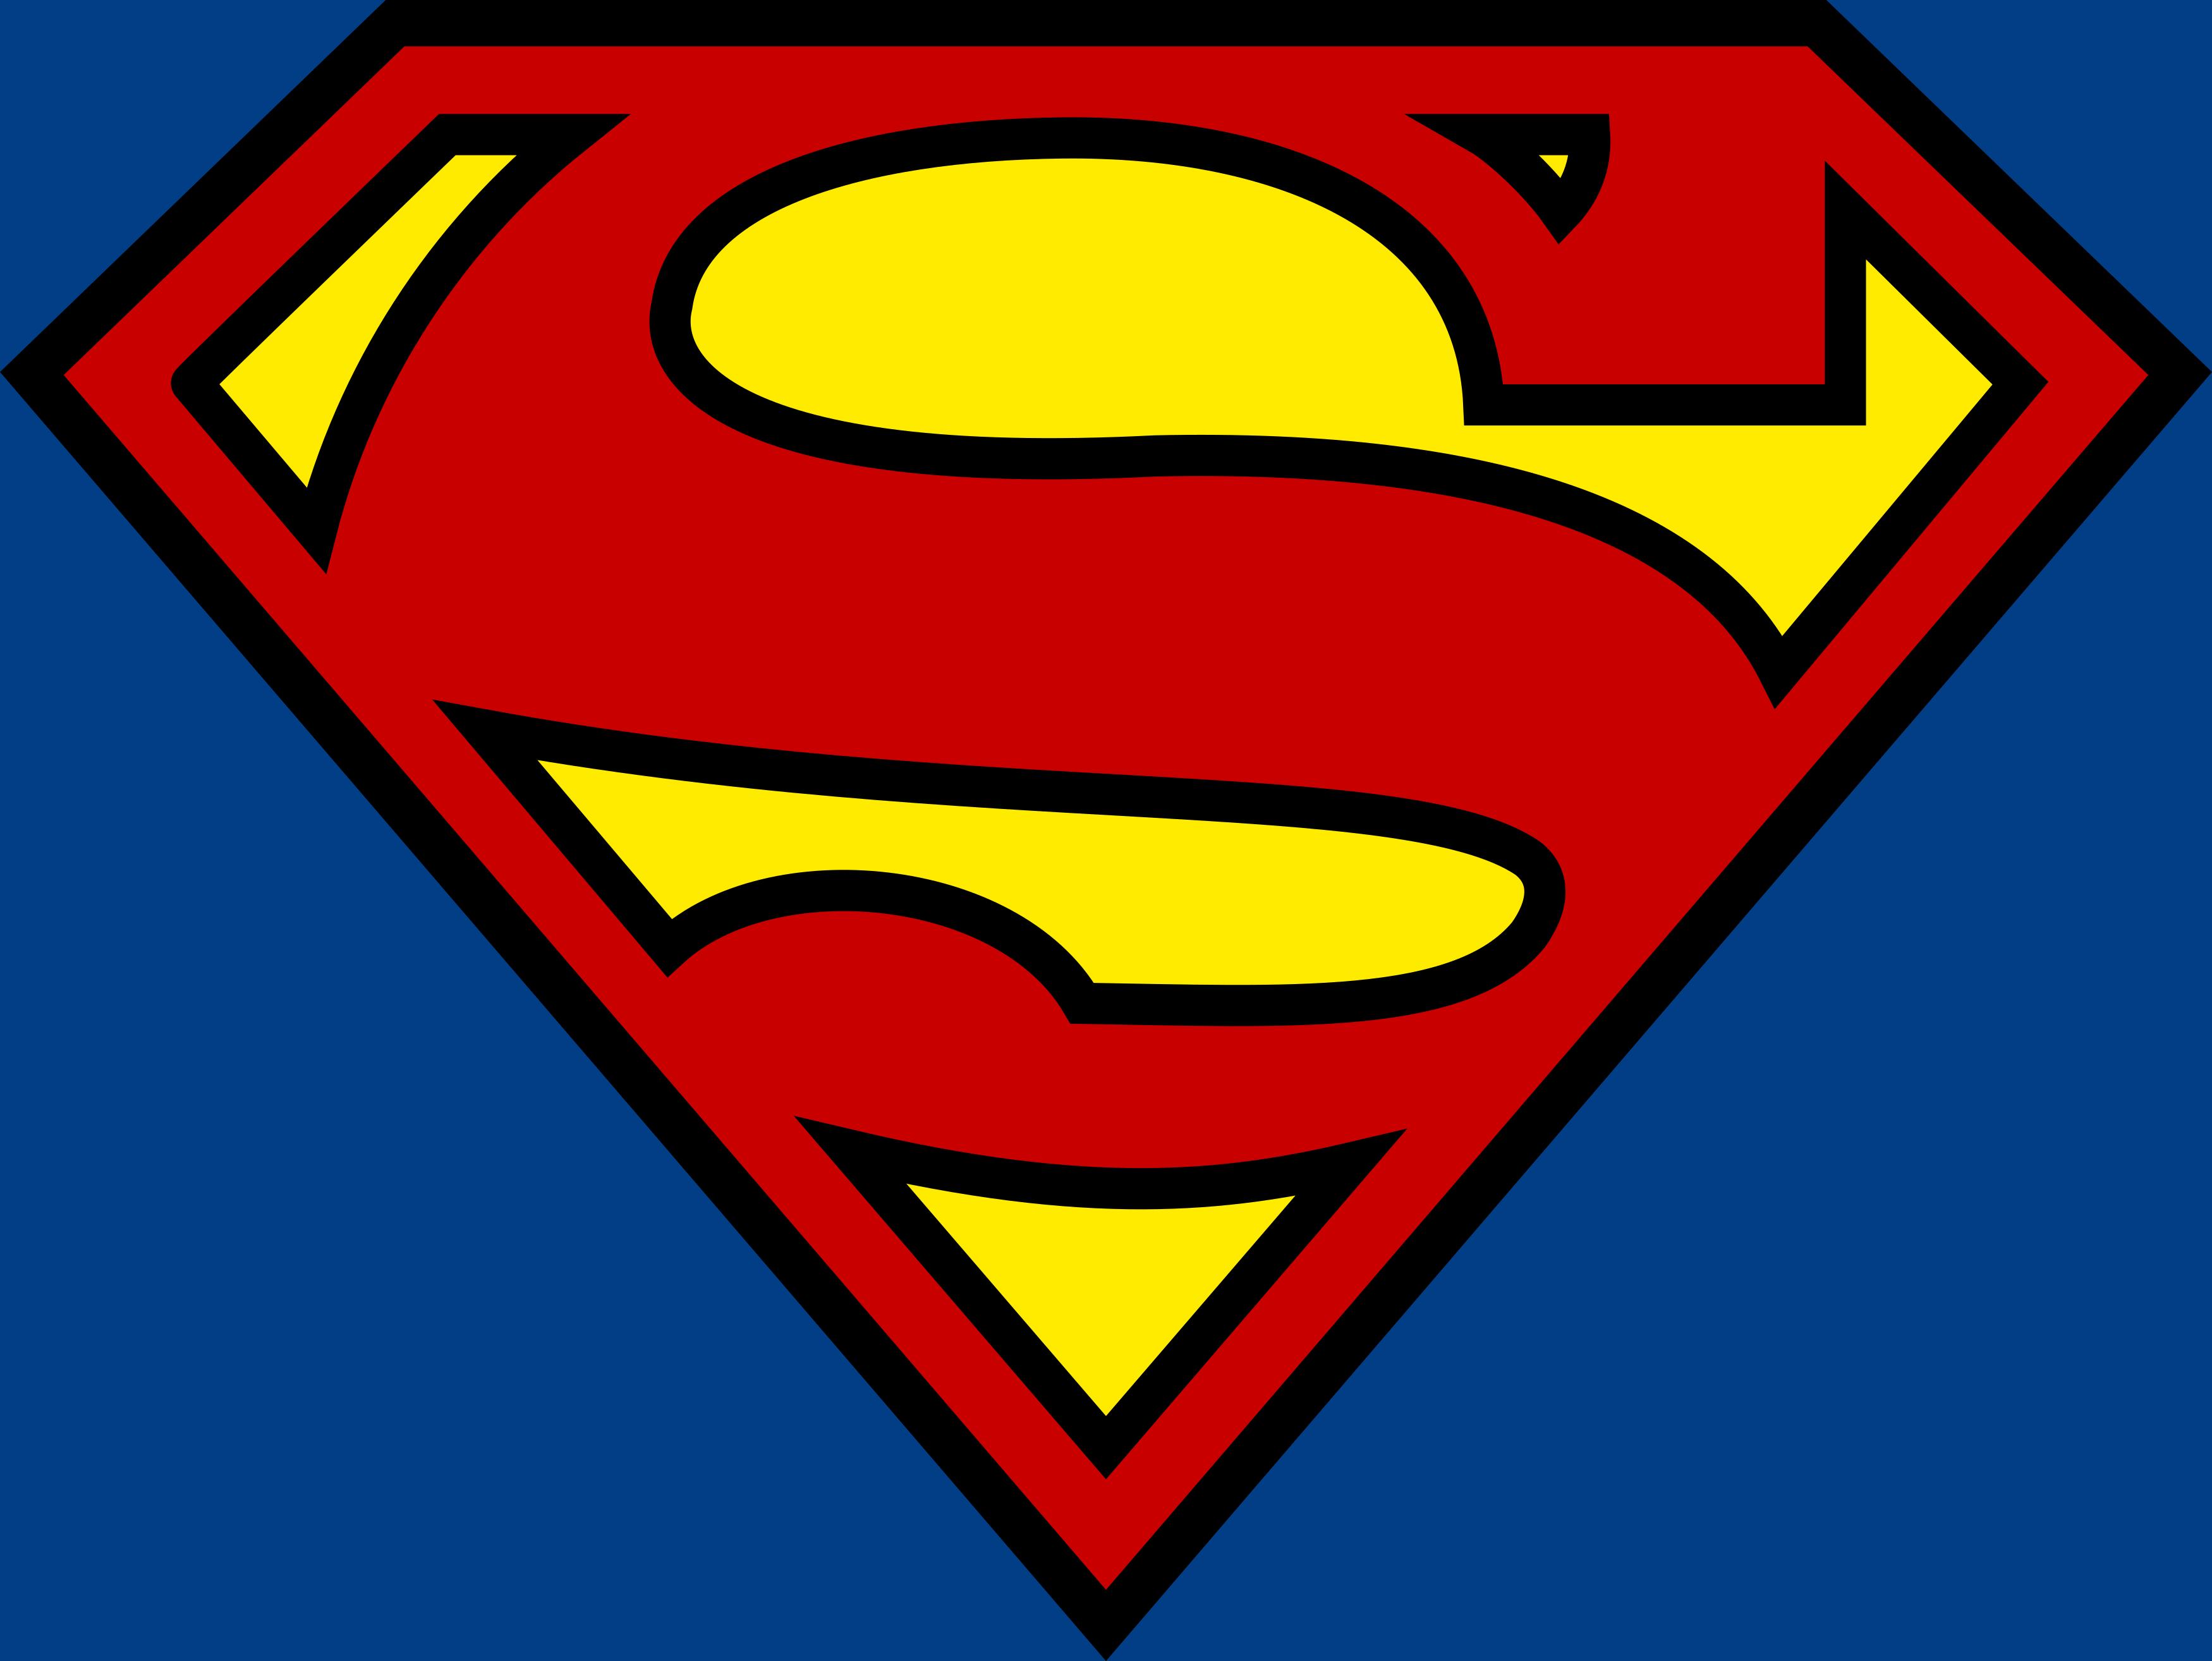 Superman Logo, Super homem logo.